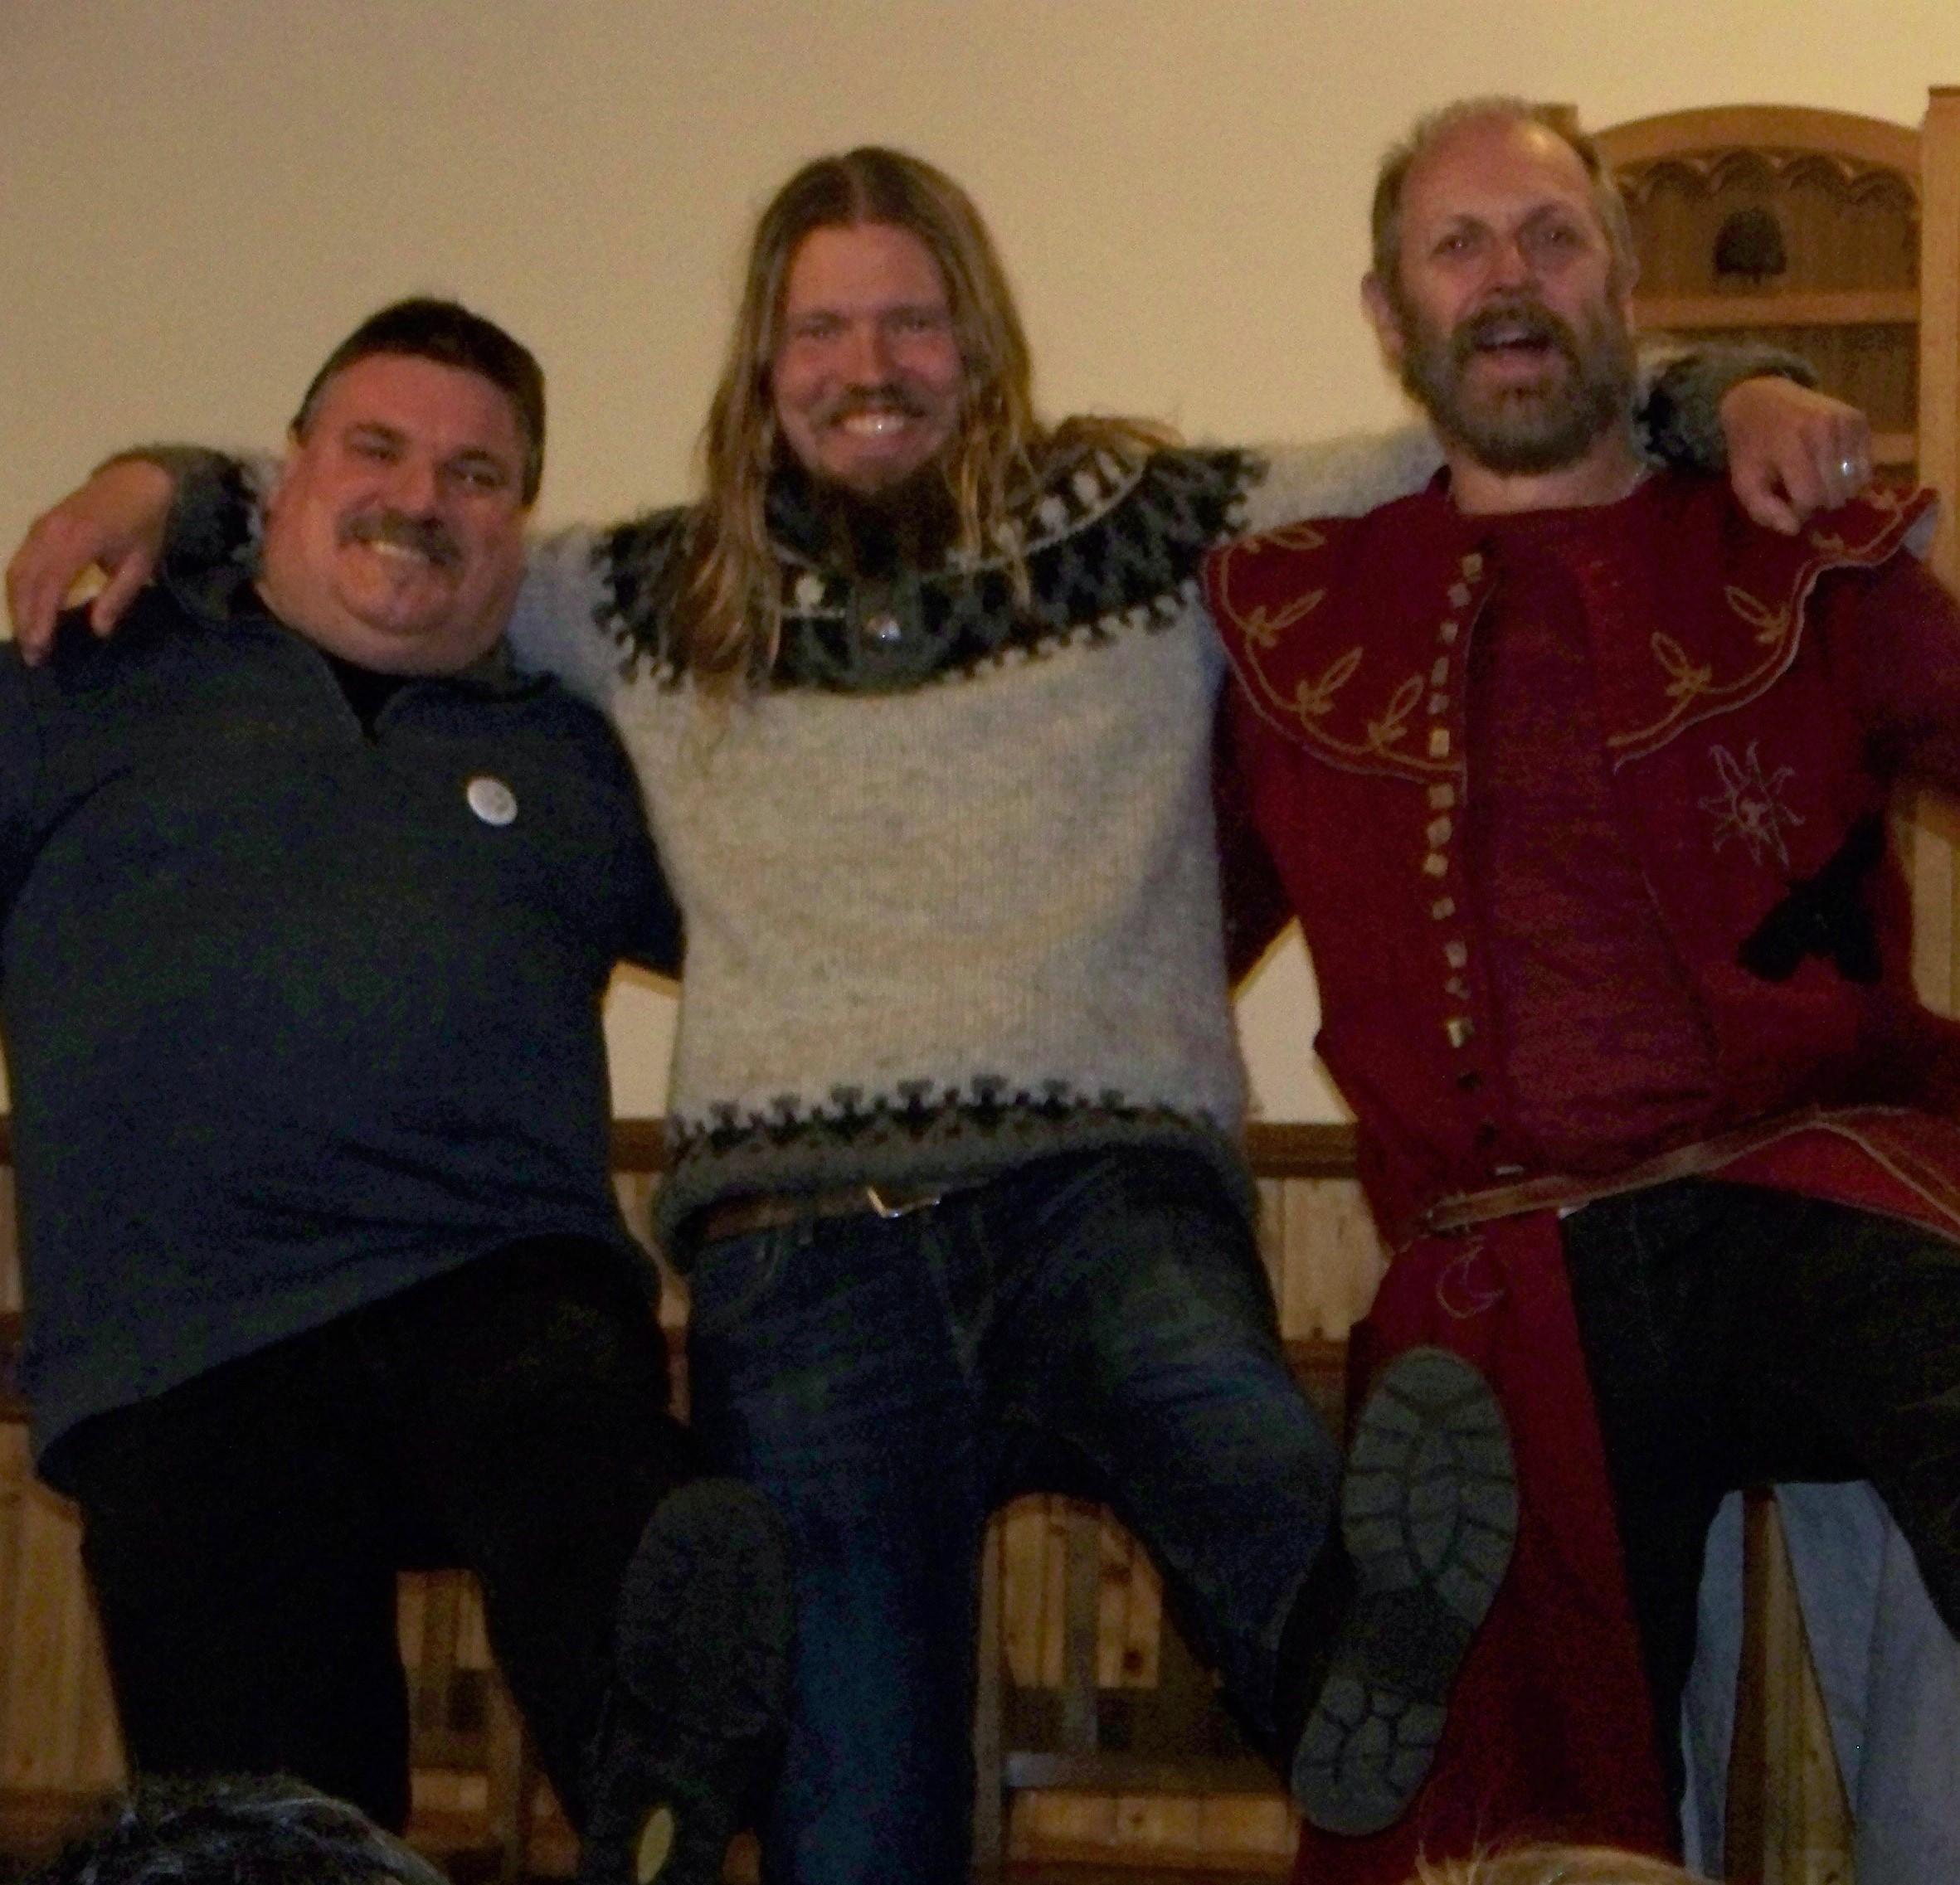 Viking storytellers, Tom Muir of Orkney, Hjorleifur Stefansson of Iceland and Jerker Fahlstrom of Sweden - at the Orkney Storytelling Festival